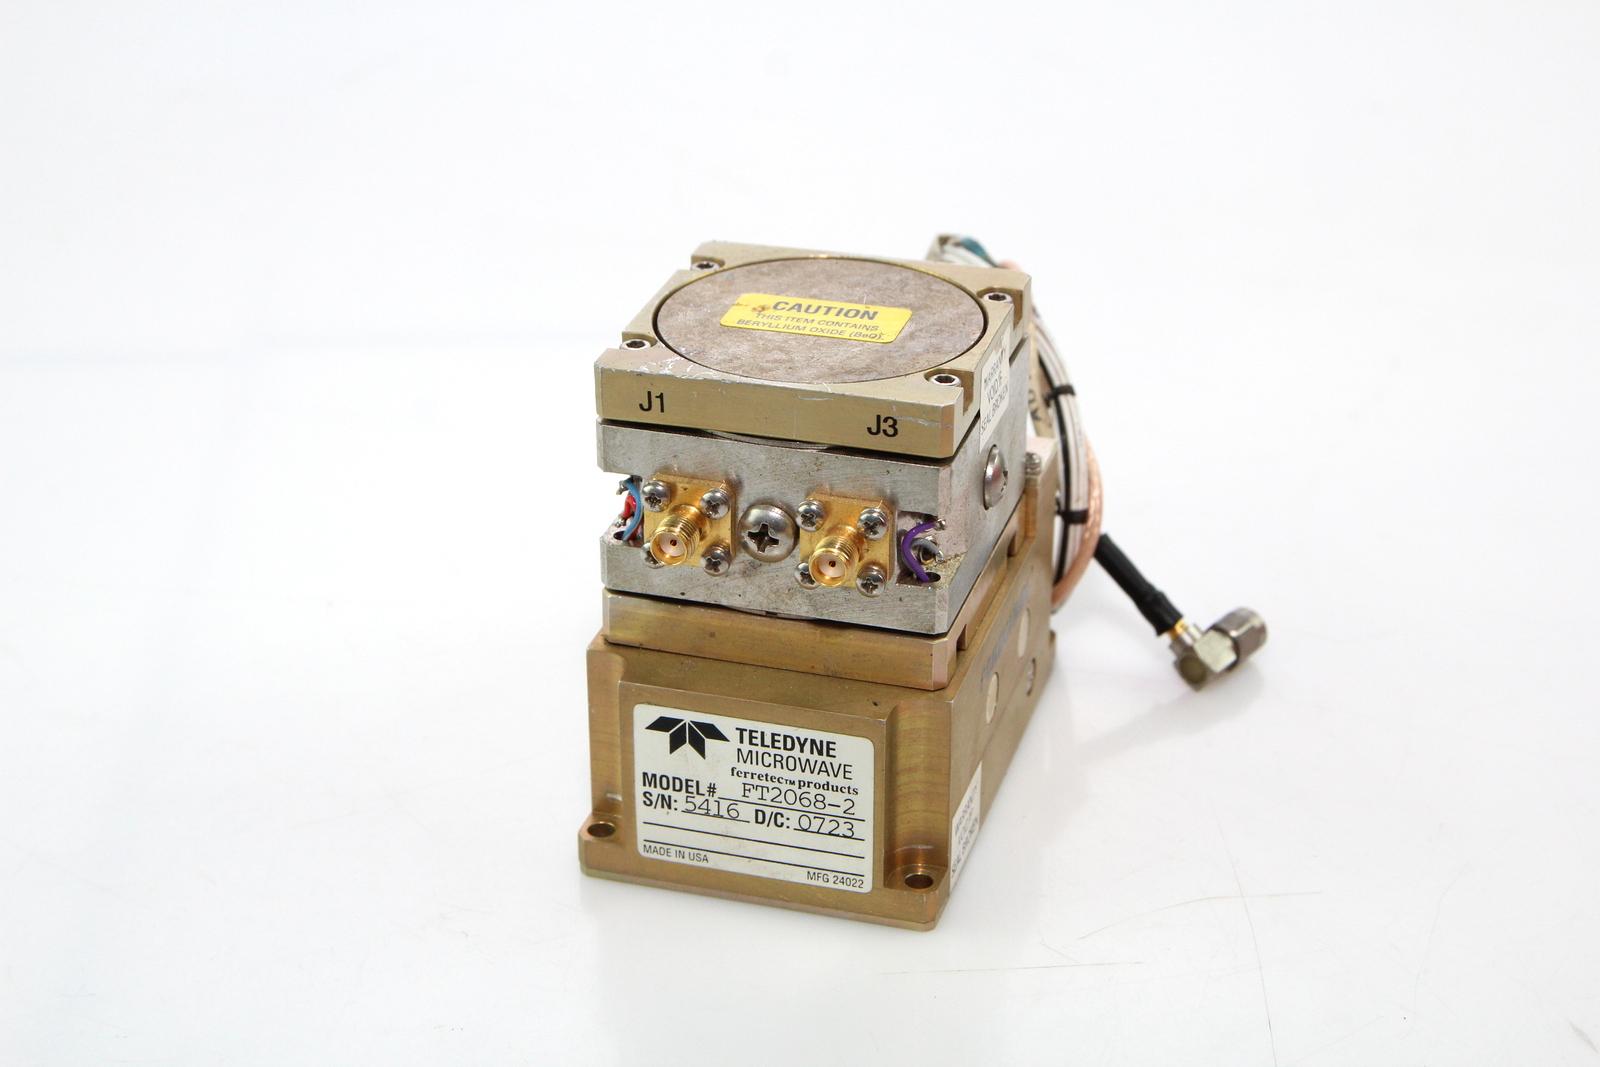 Ferretec FT2068-2 RF Microwave YIG Bandpass Filter